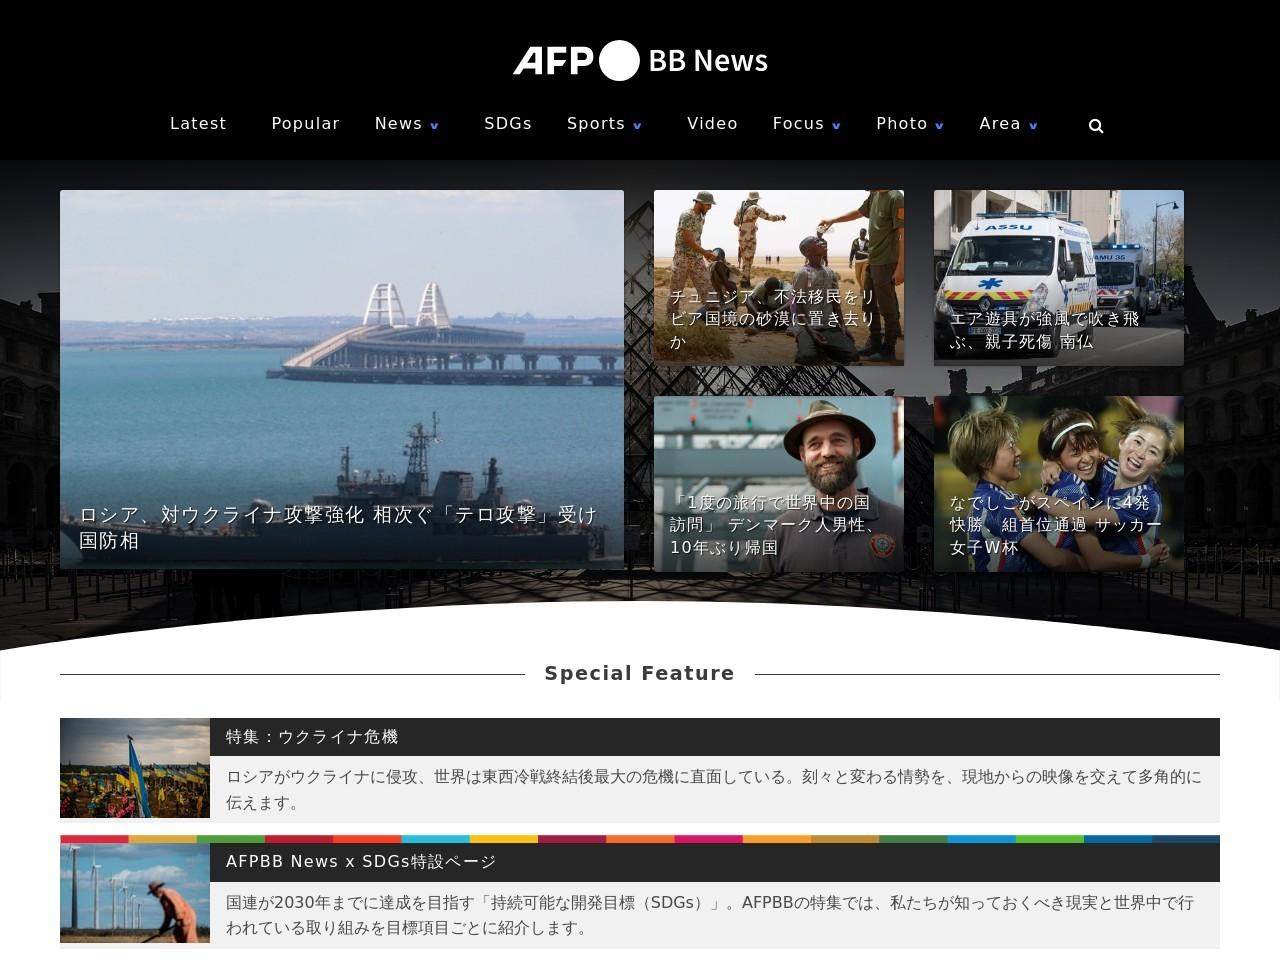 http://www.afpbb.com/articles/-/3074498